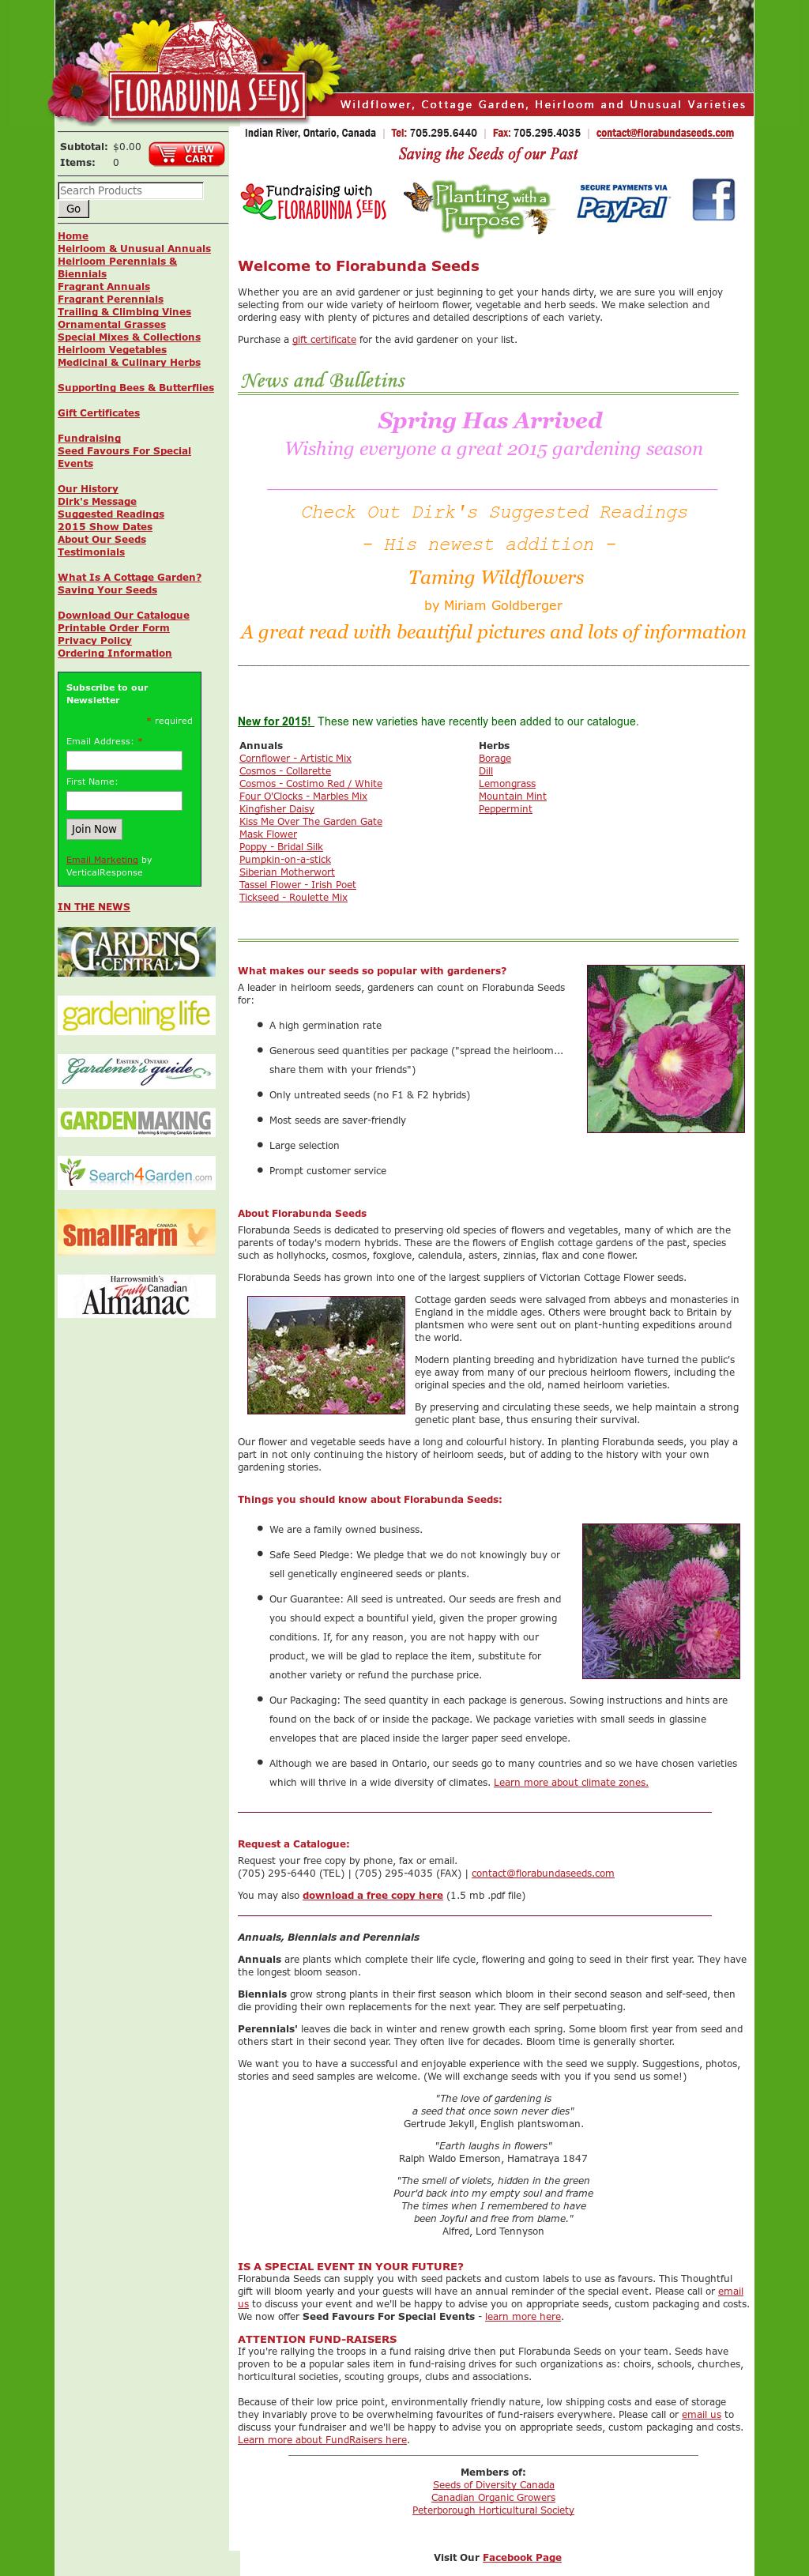 Florabunda Seeds Competitors, Revenue and Employees - Owler